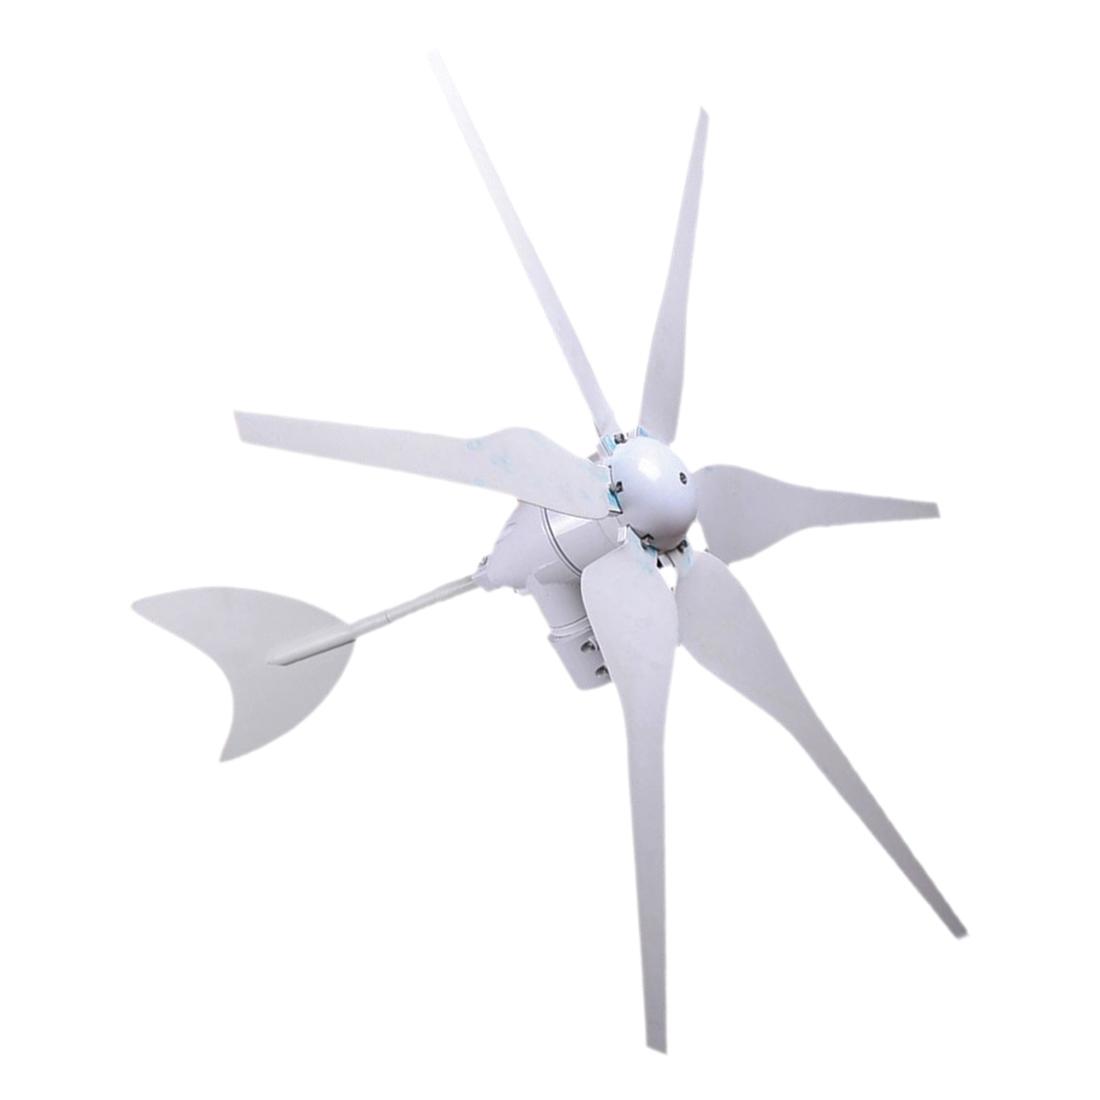 6 blade 300 watt max wind turbine generator 12 volt dcoutput 12v current dc x5b4 ebay. Black Bedroom Furniture Sets. Home Design Ideas